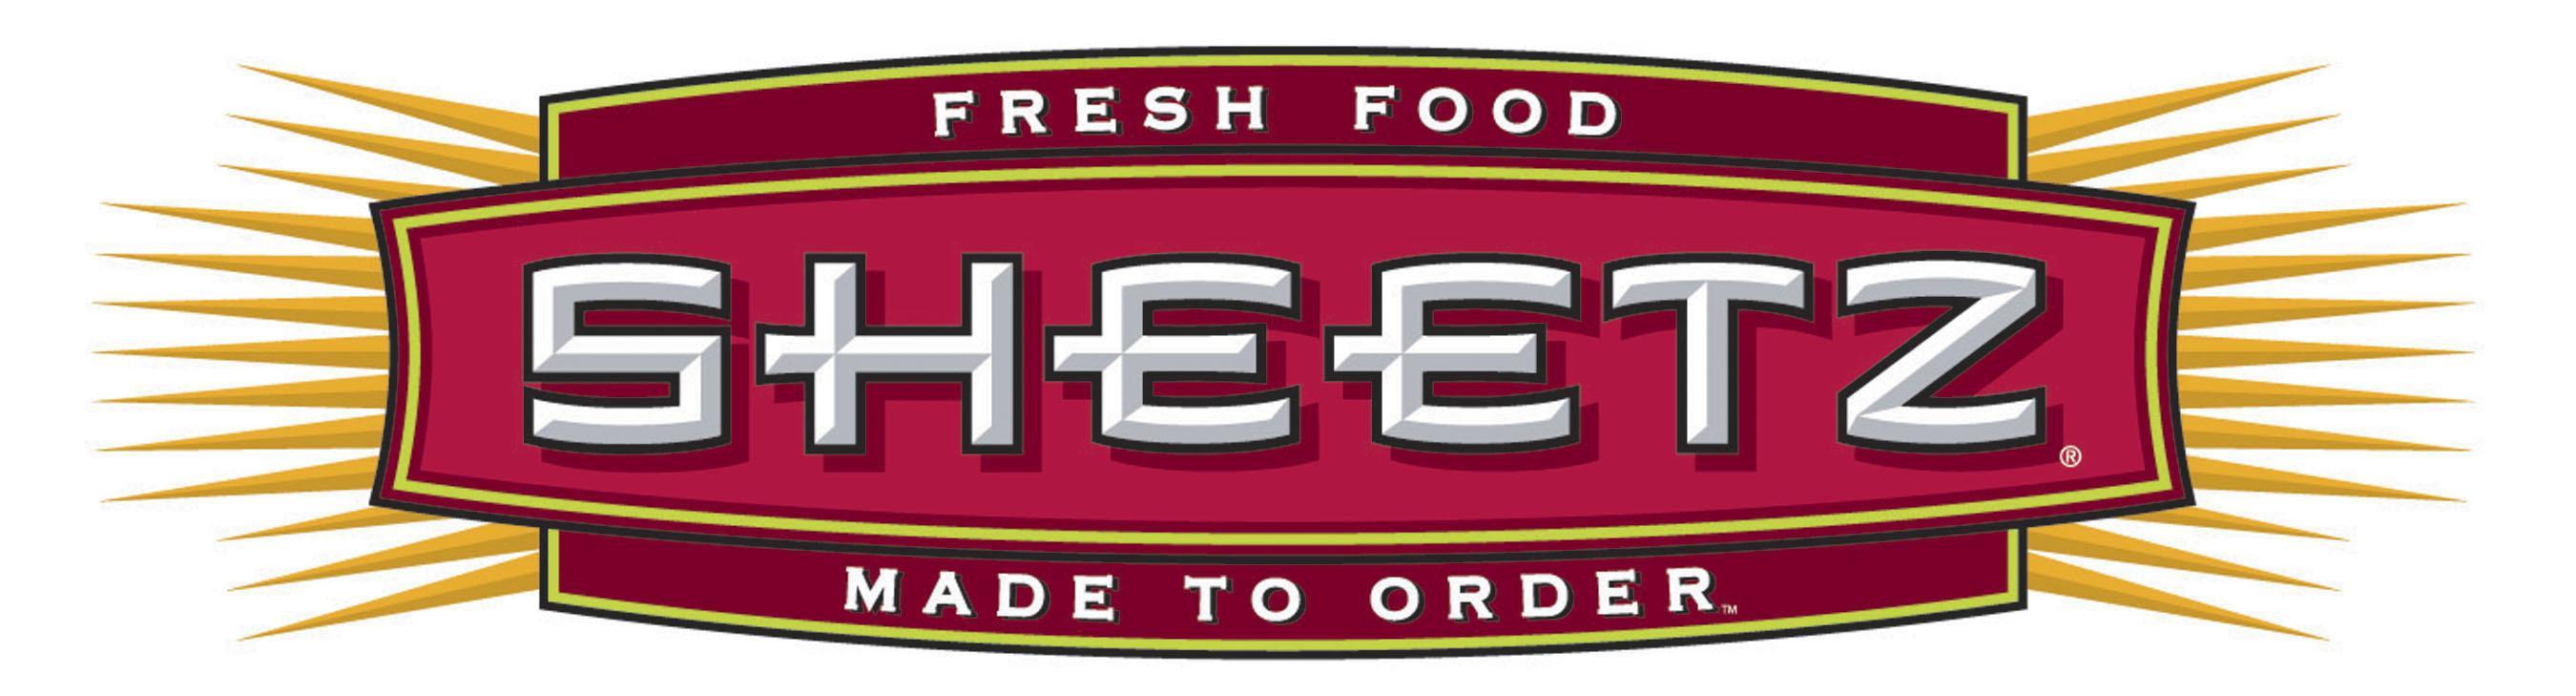 Sheetz logo. (PRNewsFoto/SHEETZ, INC.)